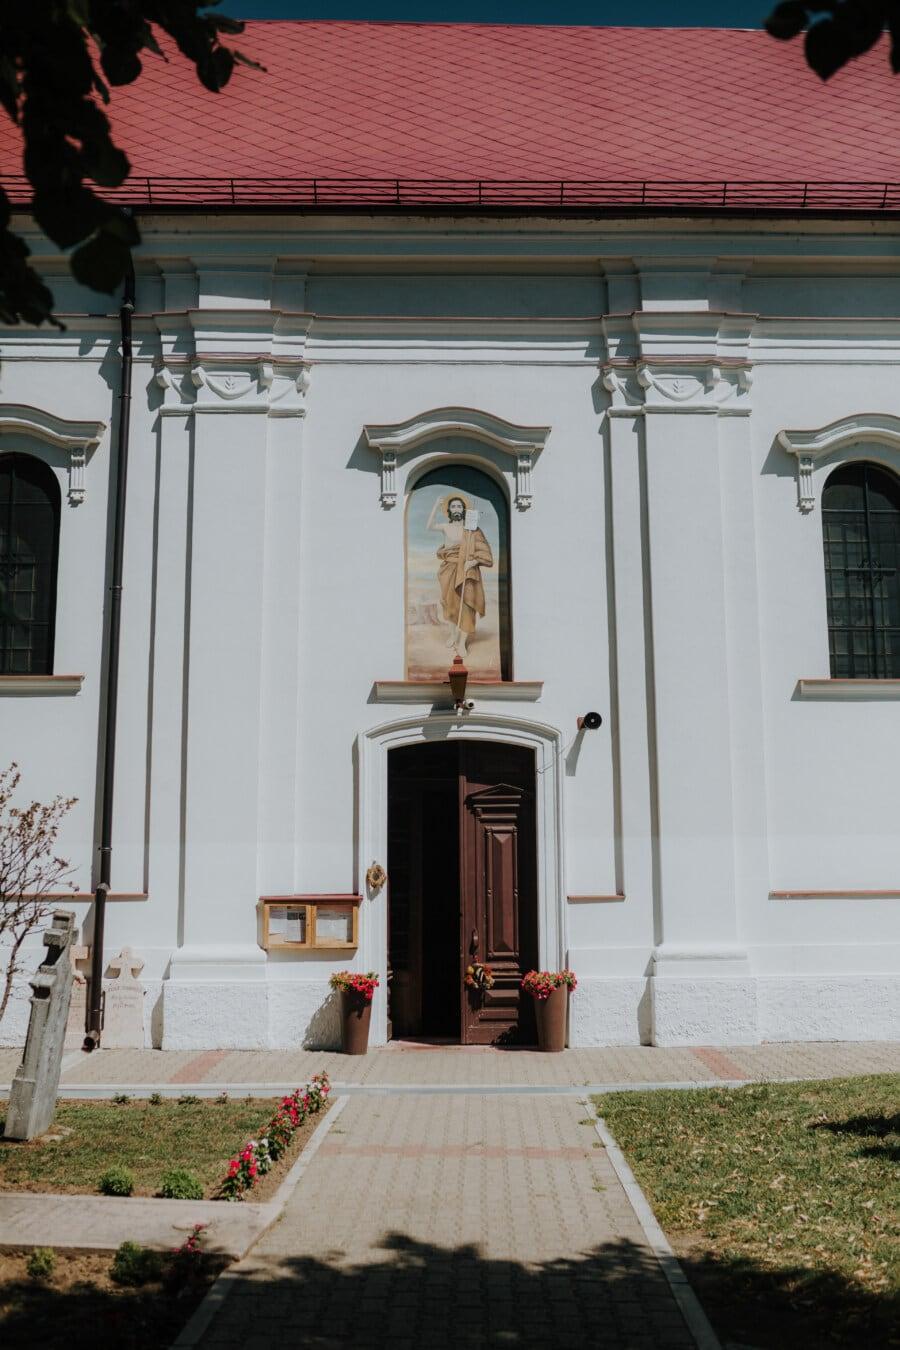 front door, gateway, orthodox, gravestone, church, grave, cemetery, wall, fine arts, saint